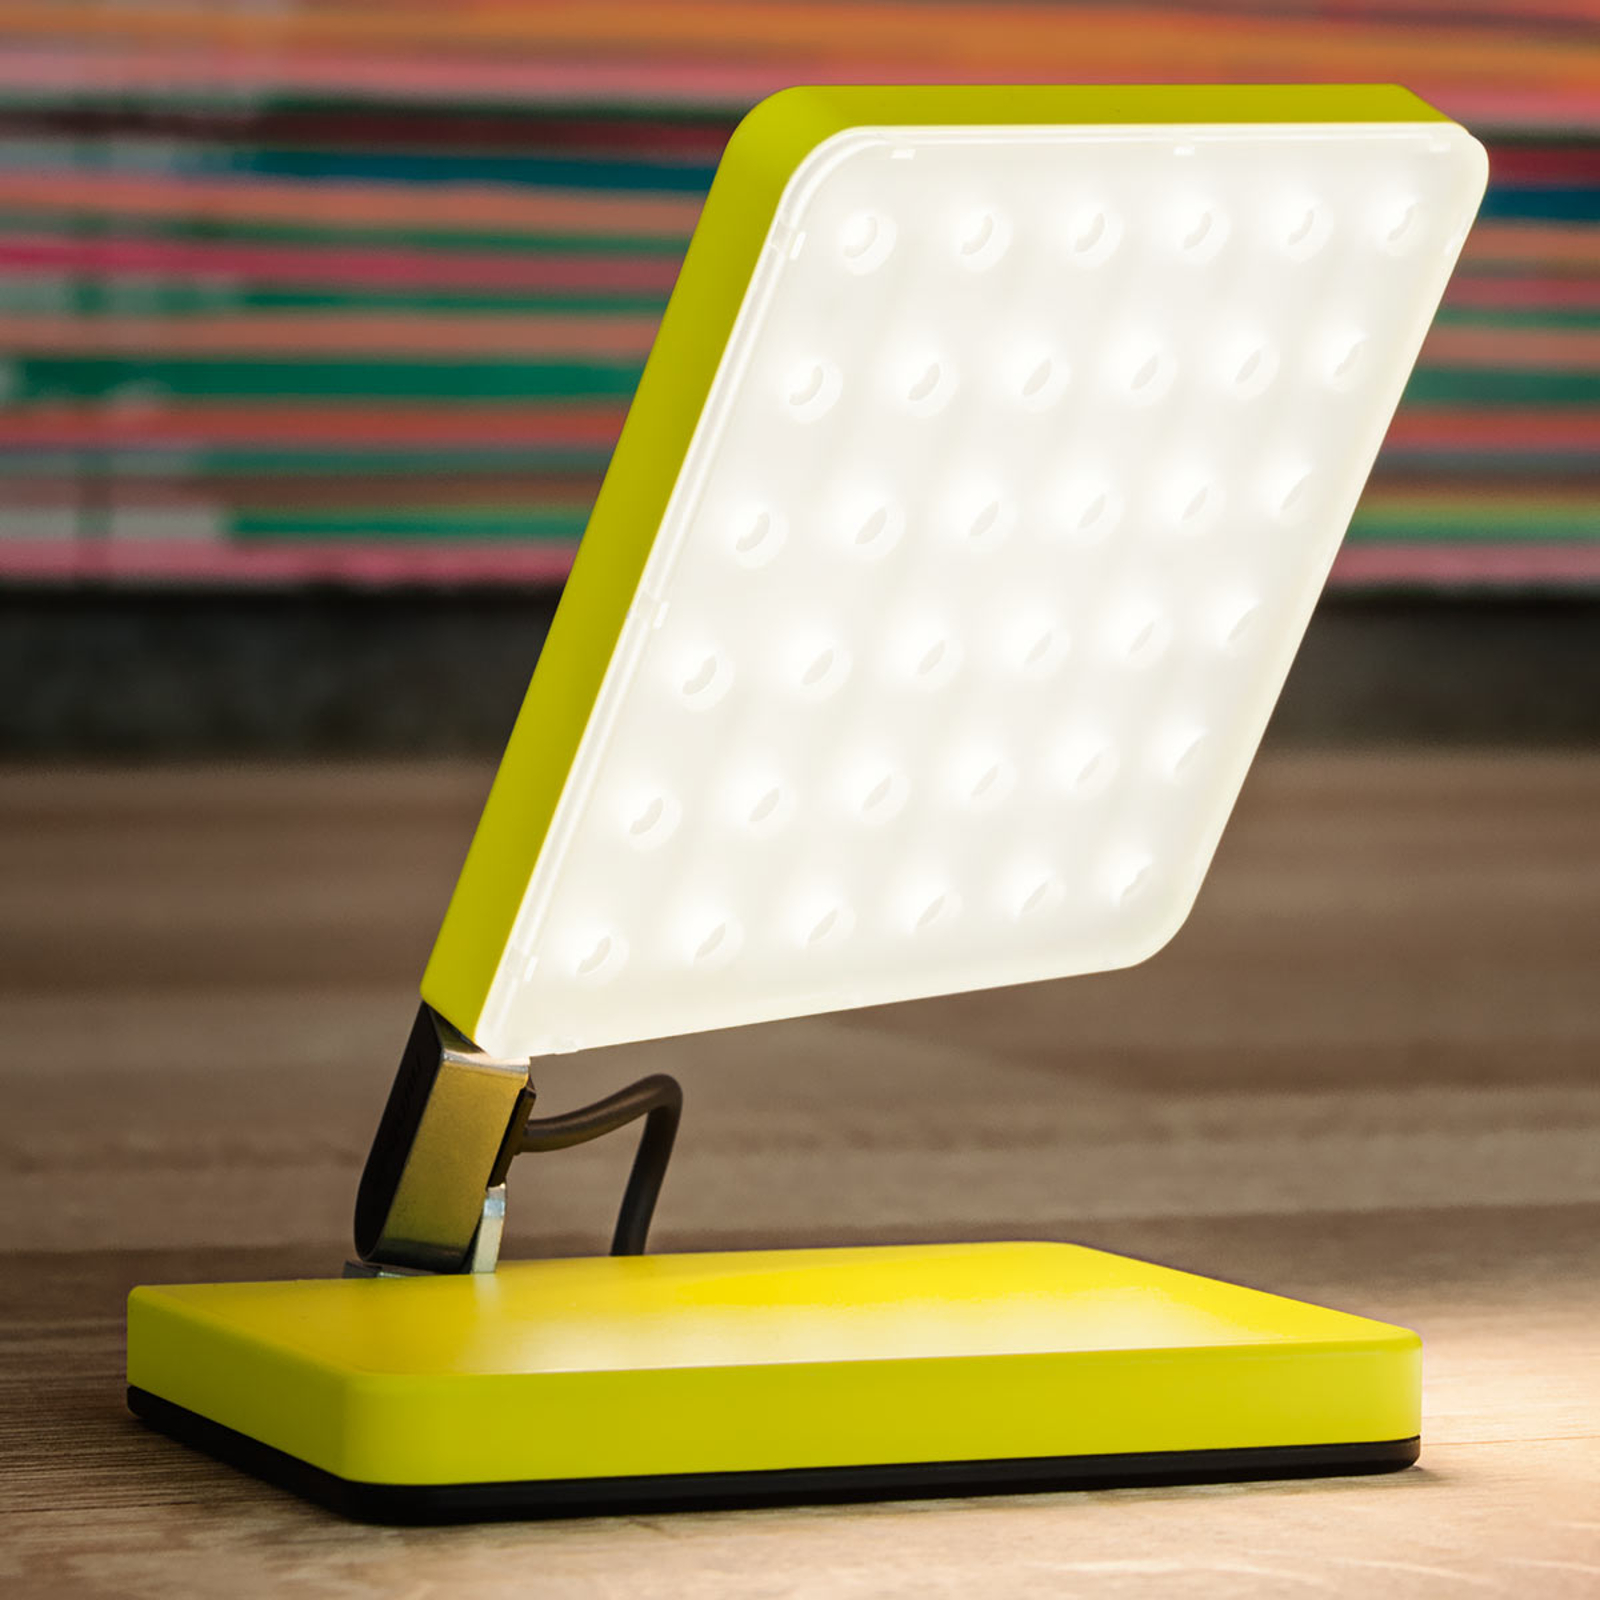 Nimbus Roxxane Fly LED tafellamp, neon geel